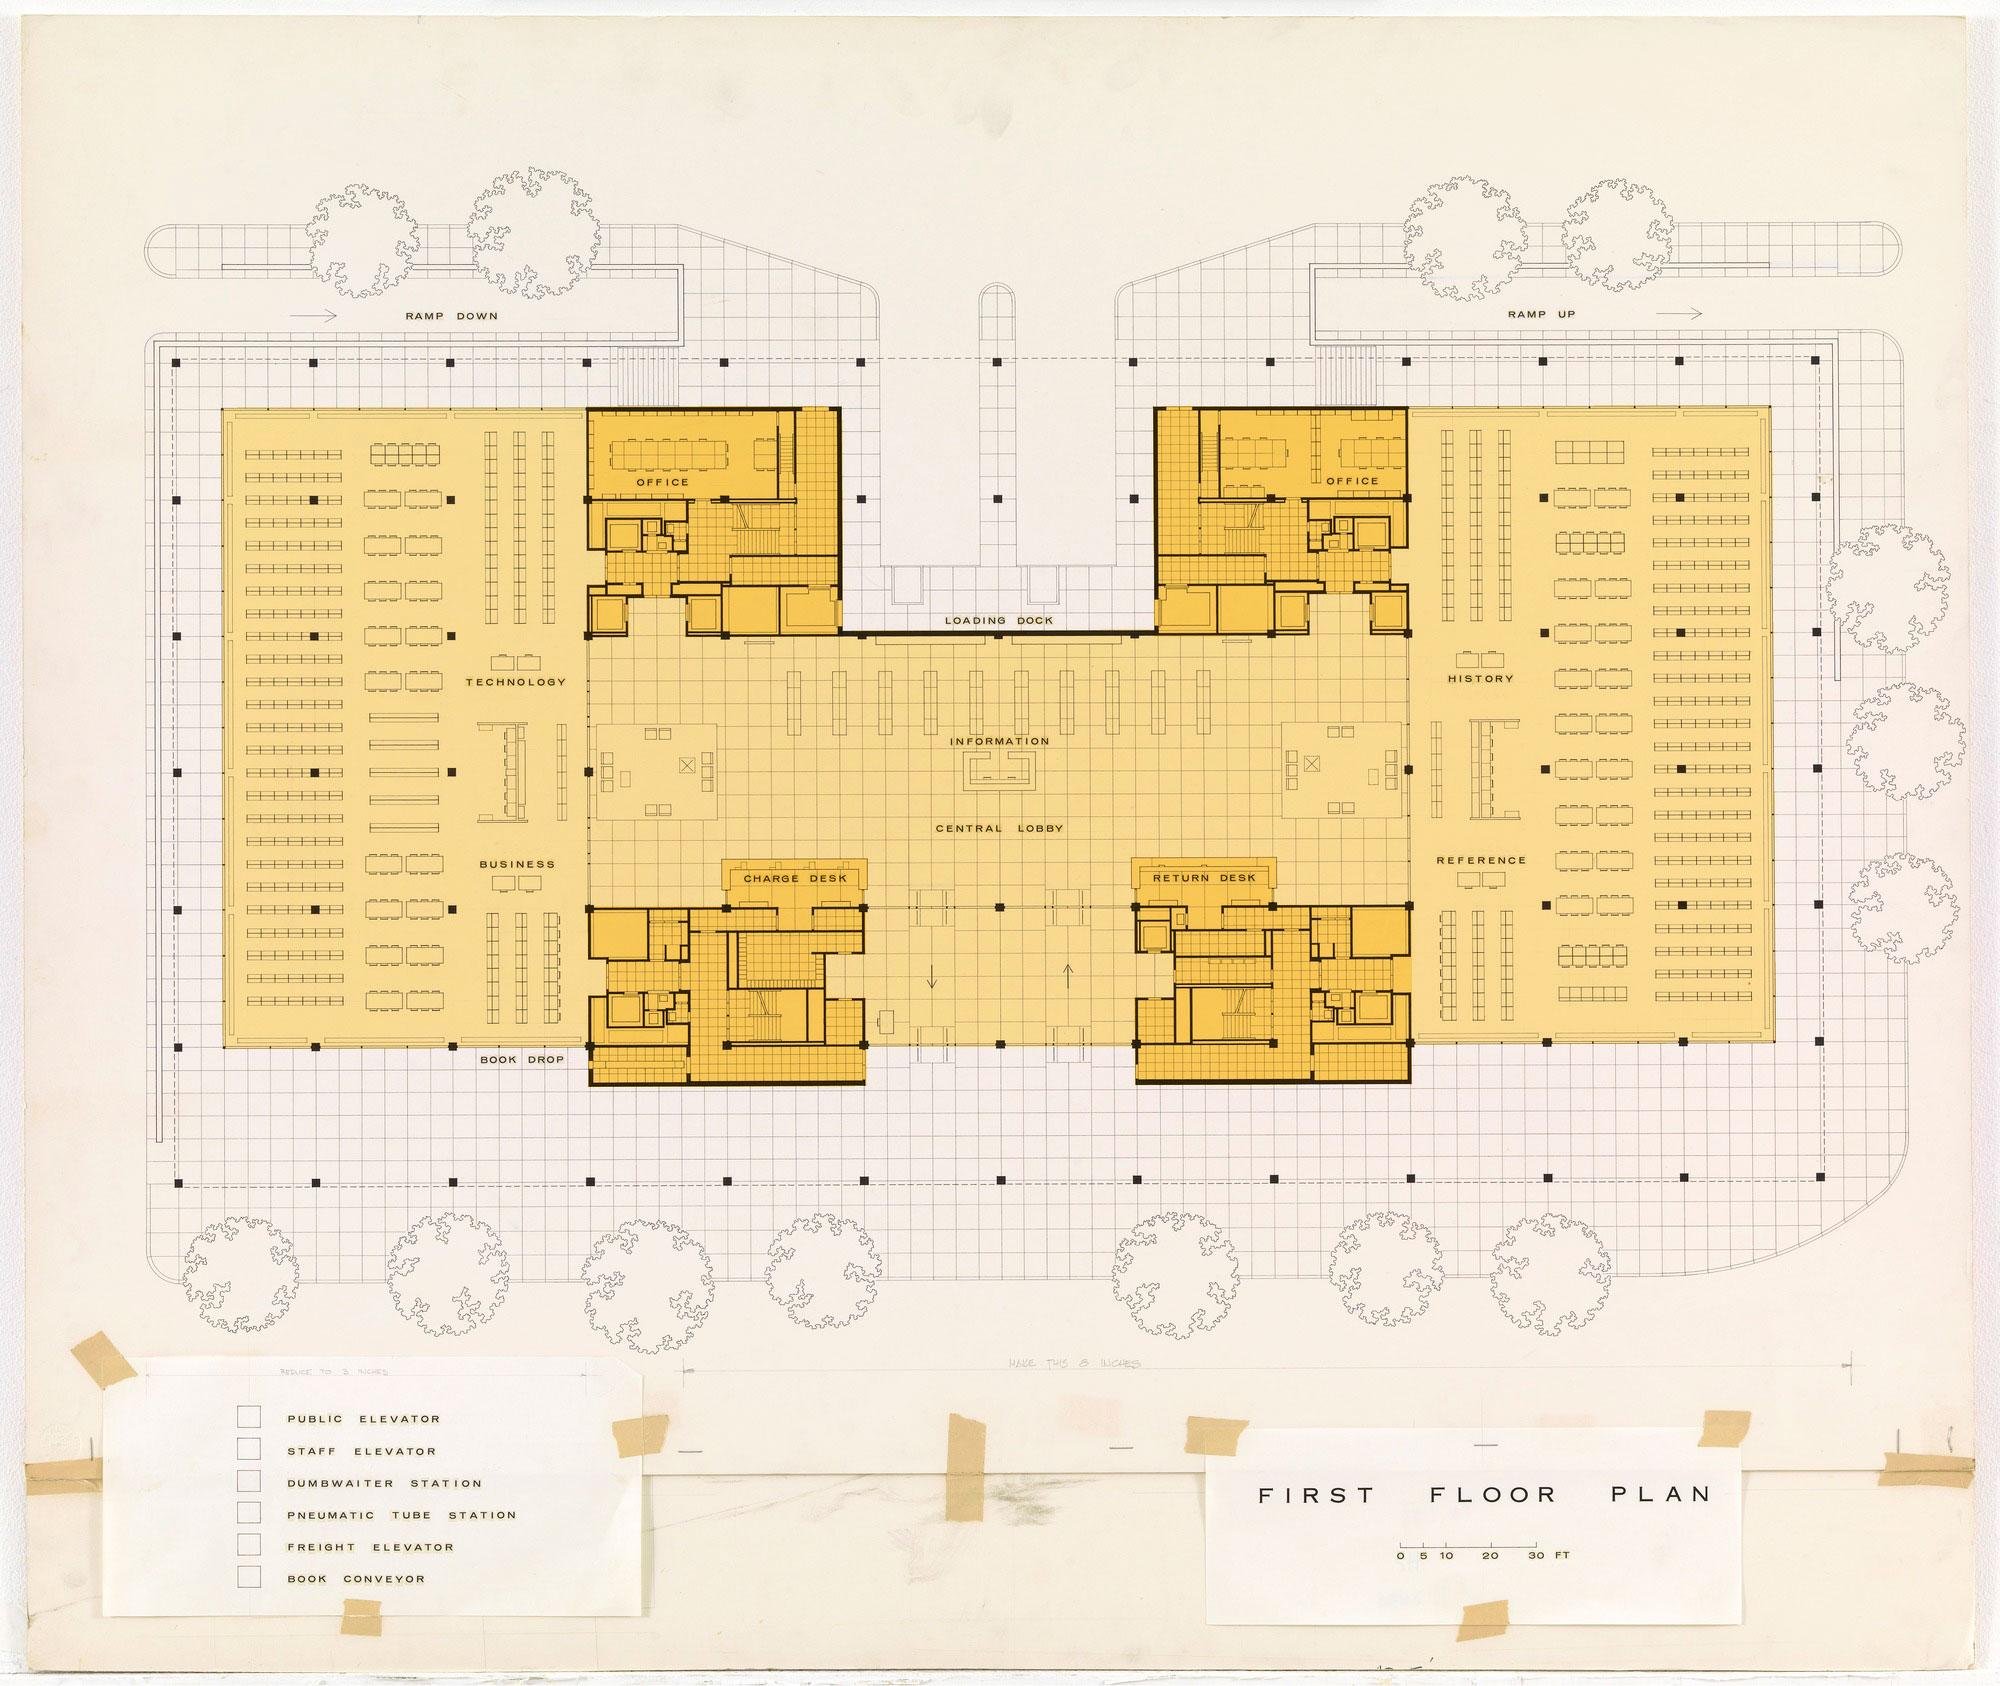 <p>Martin Luther King Jr. Library (Mies Van der Rohe, 1968), Washington, DC, first floor plan. Source: Museum of Modern Art, New York.</p>